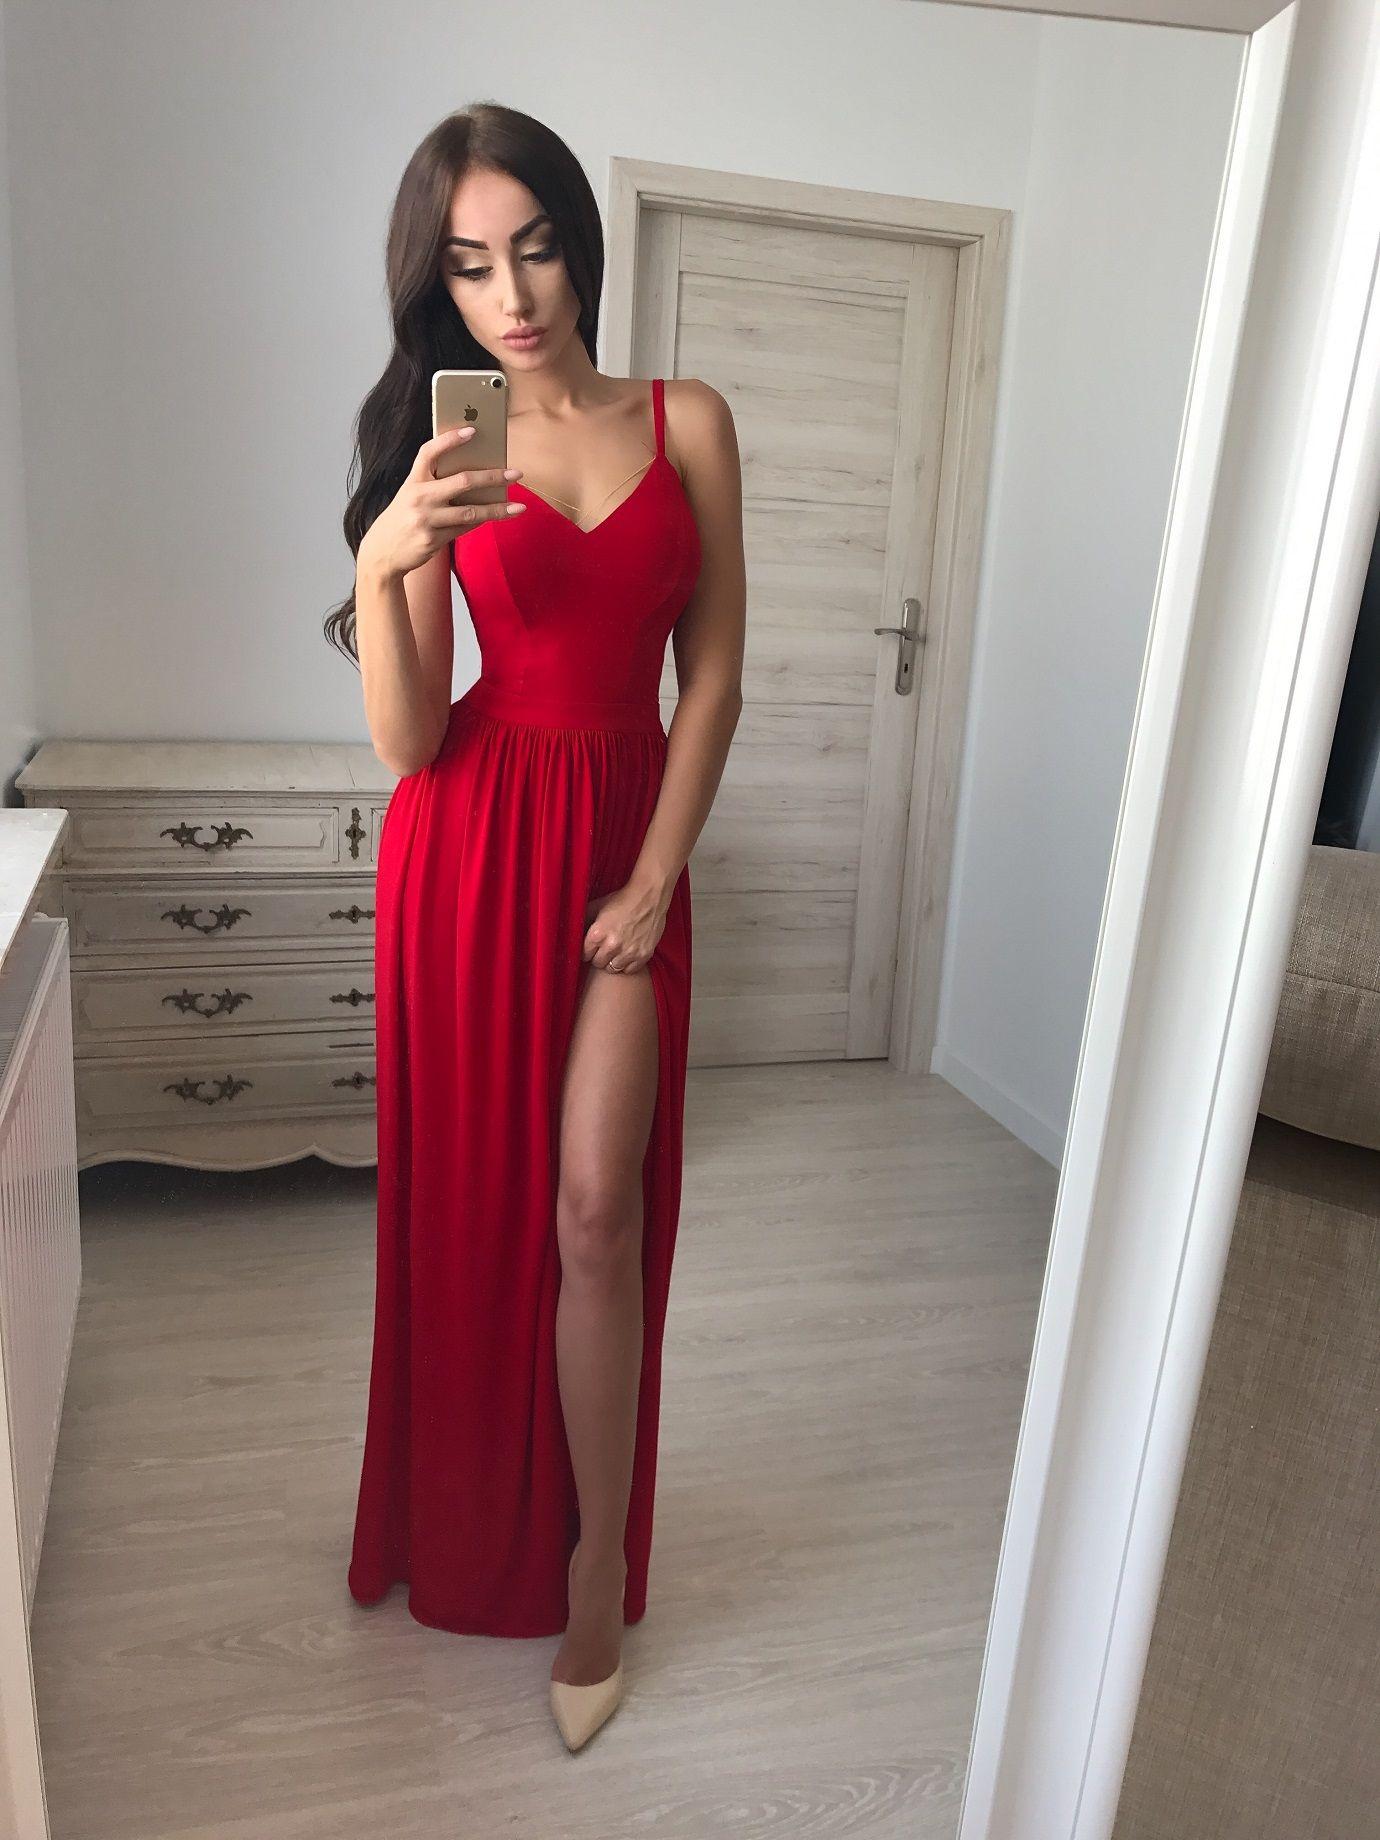 Eleg glamour spaghetti straps aline prom dressescheap prom dress